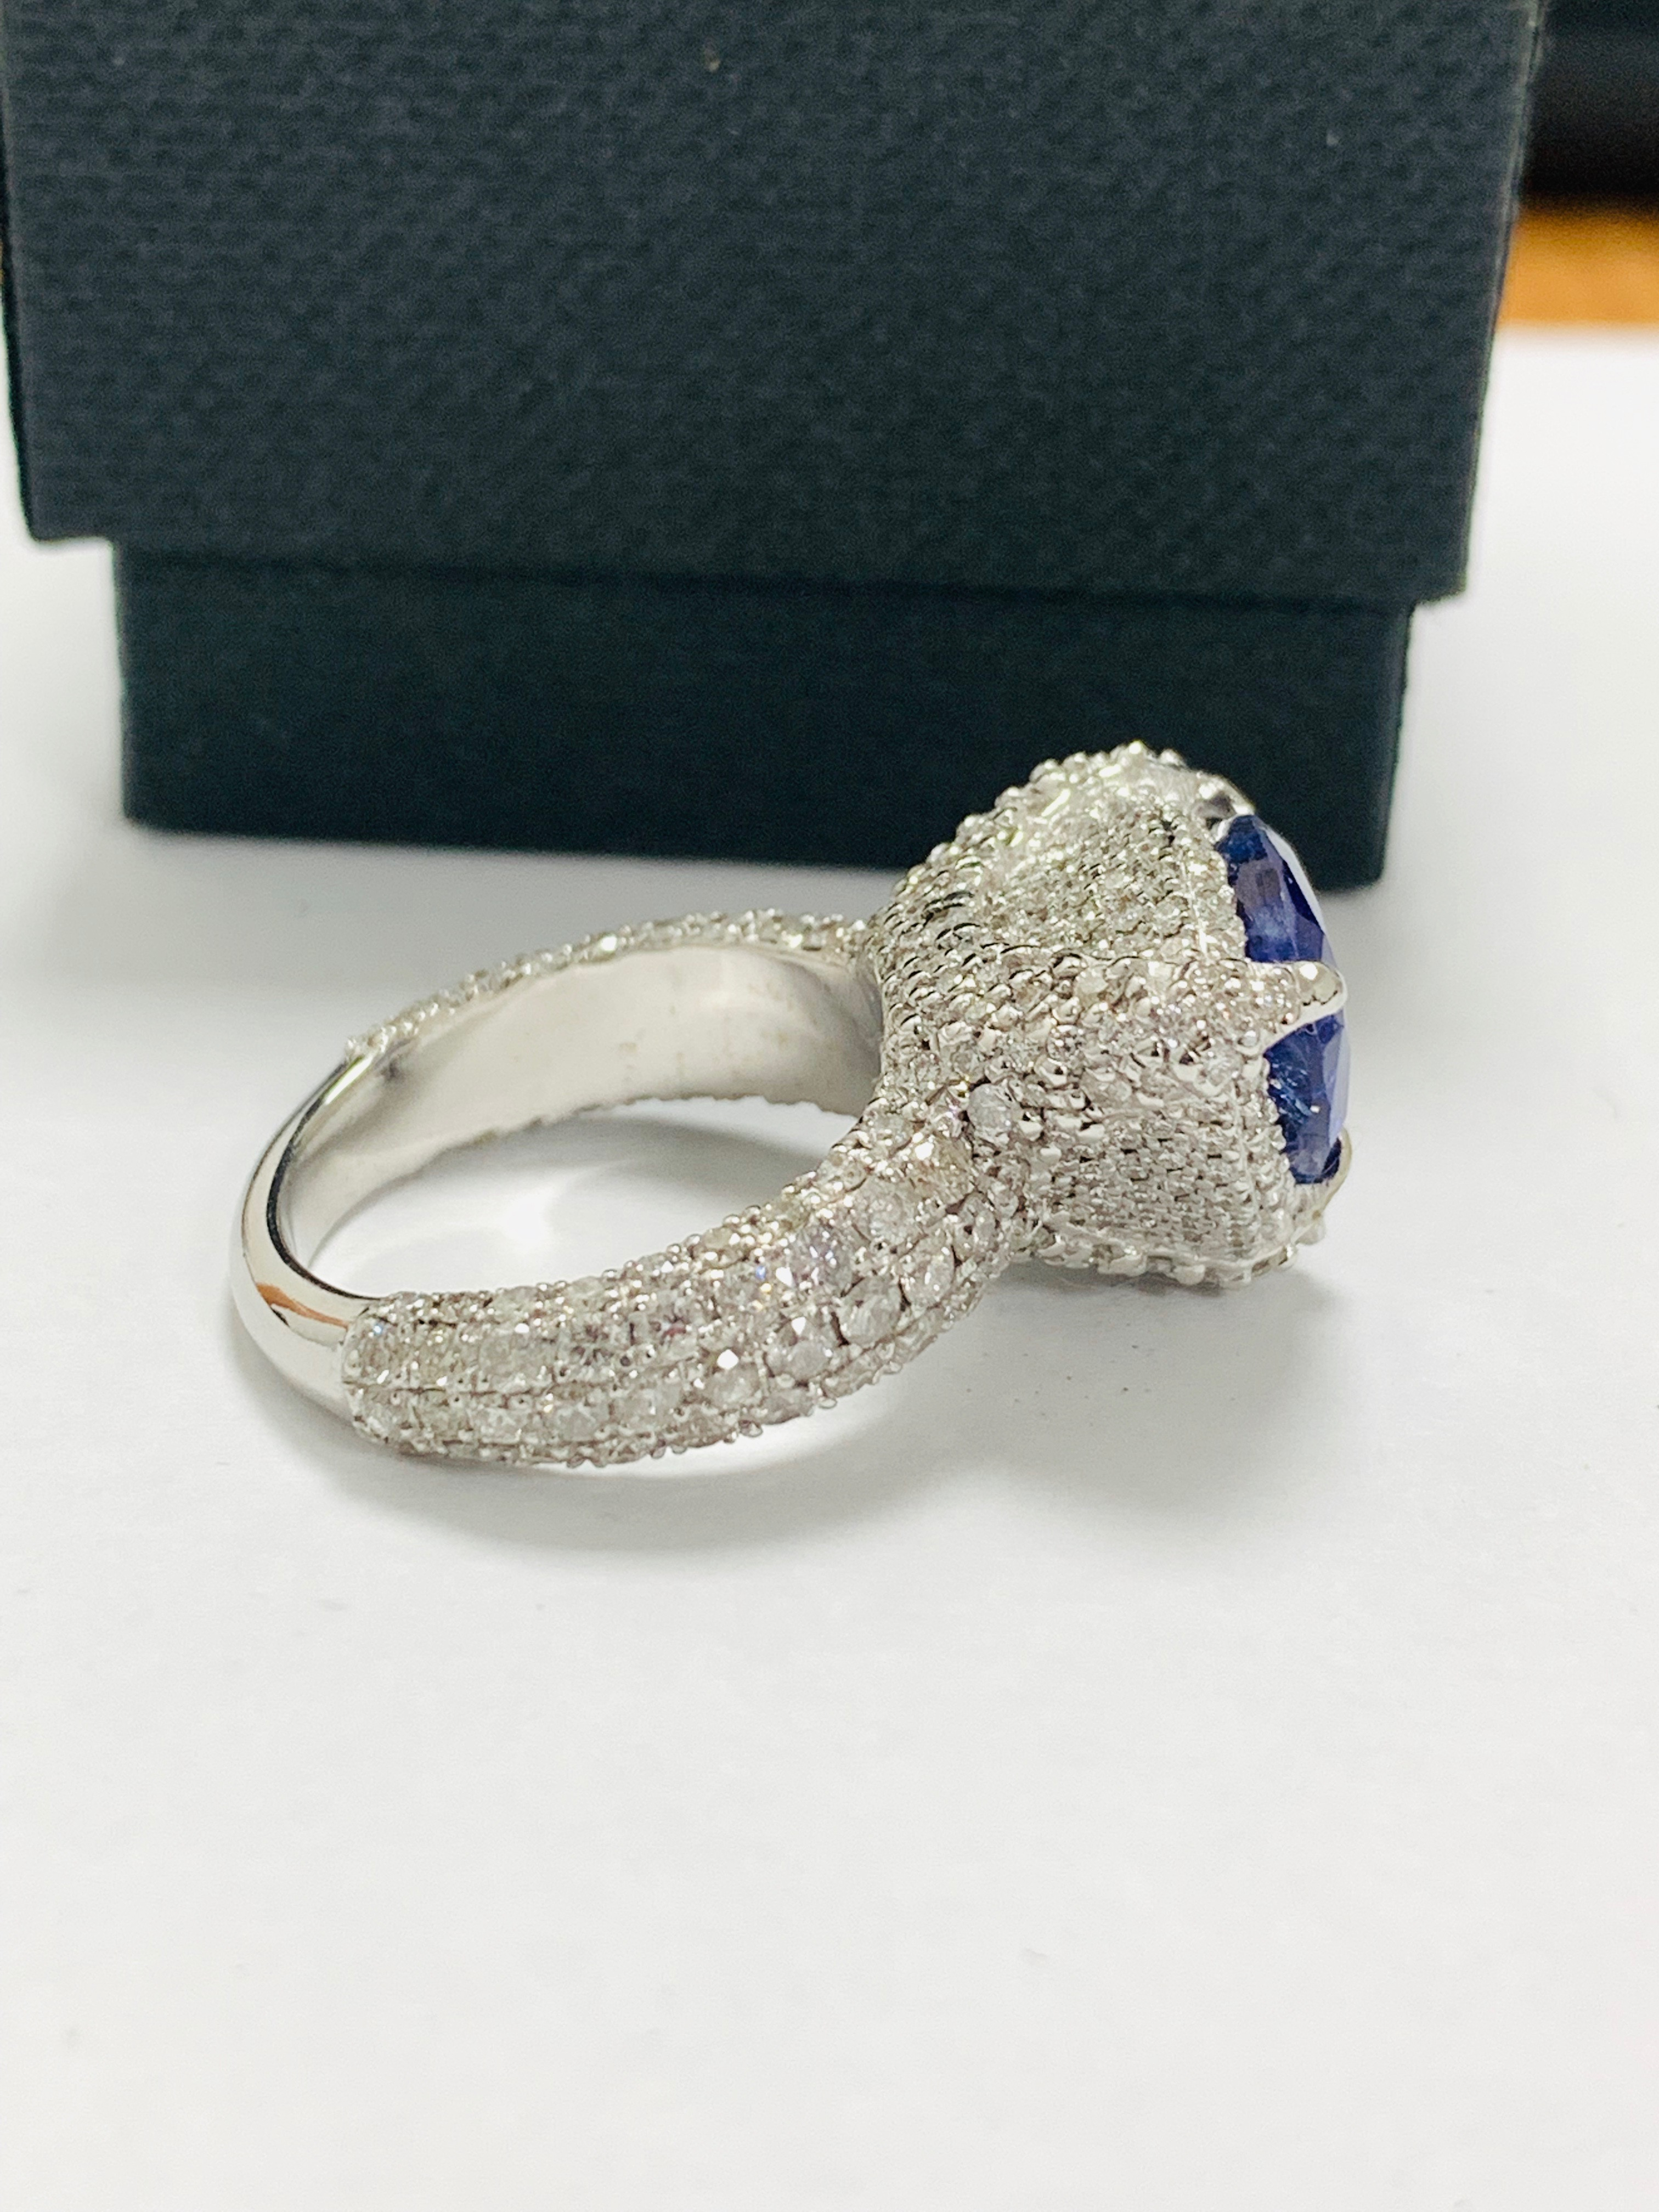 platinum tanzanite ring - Image 8 of 13